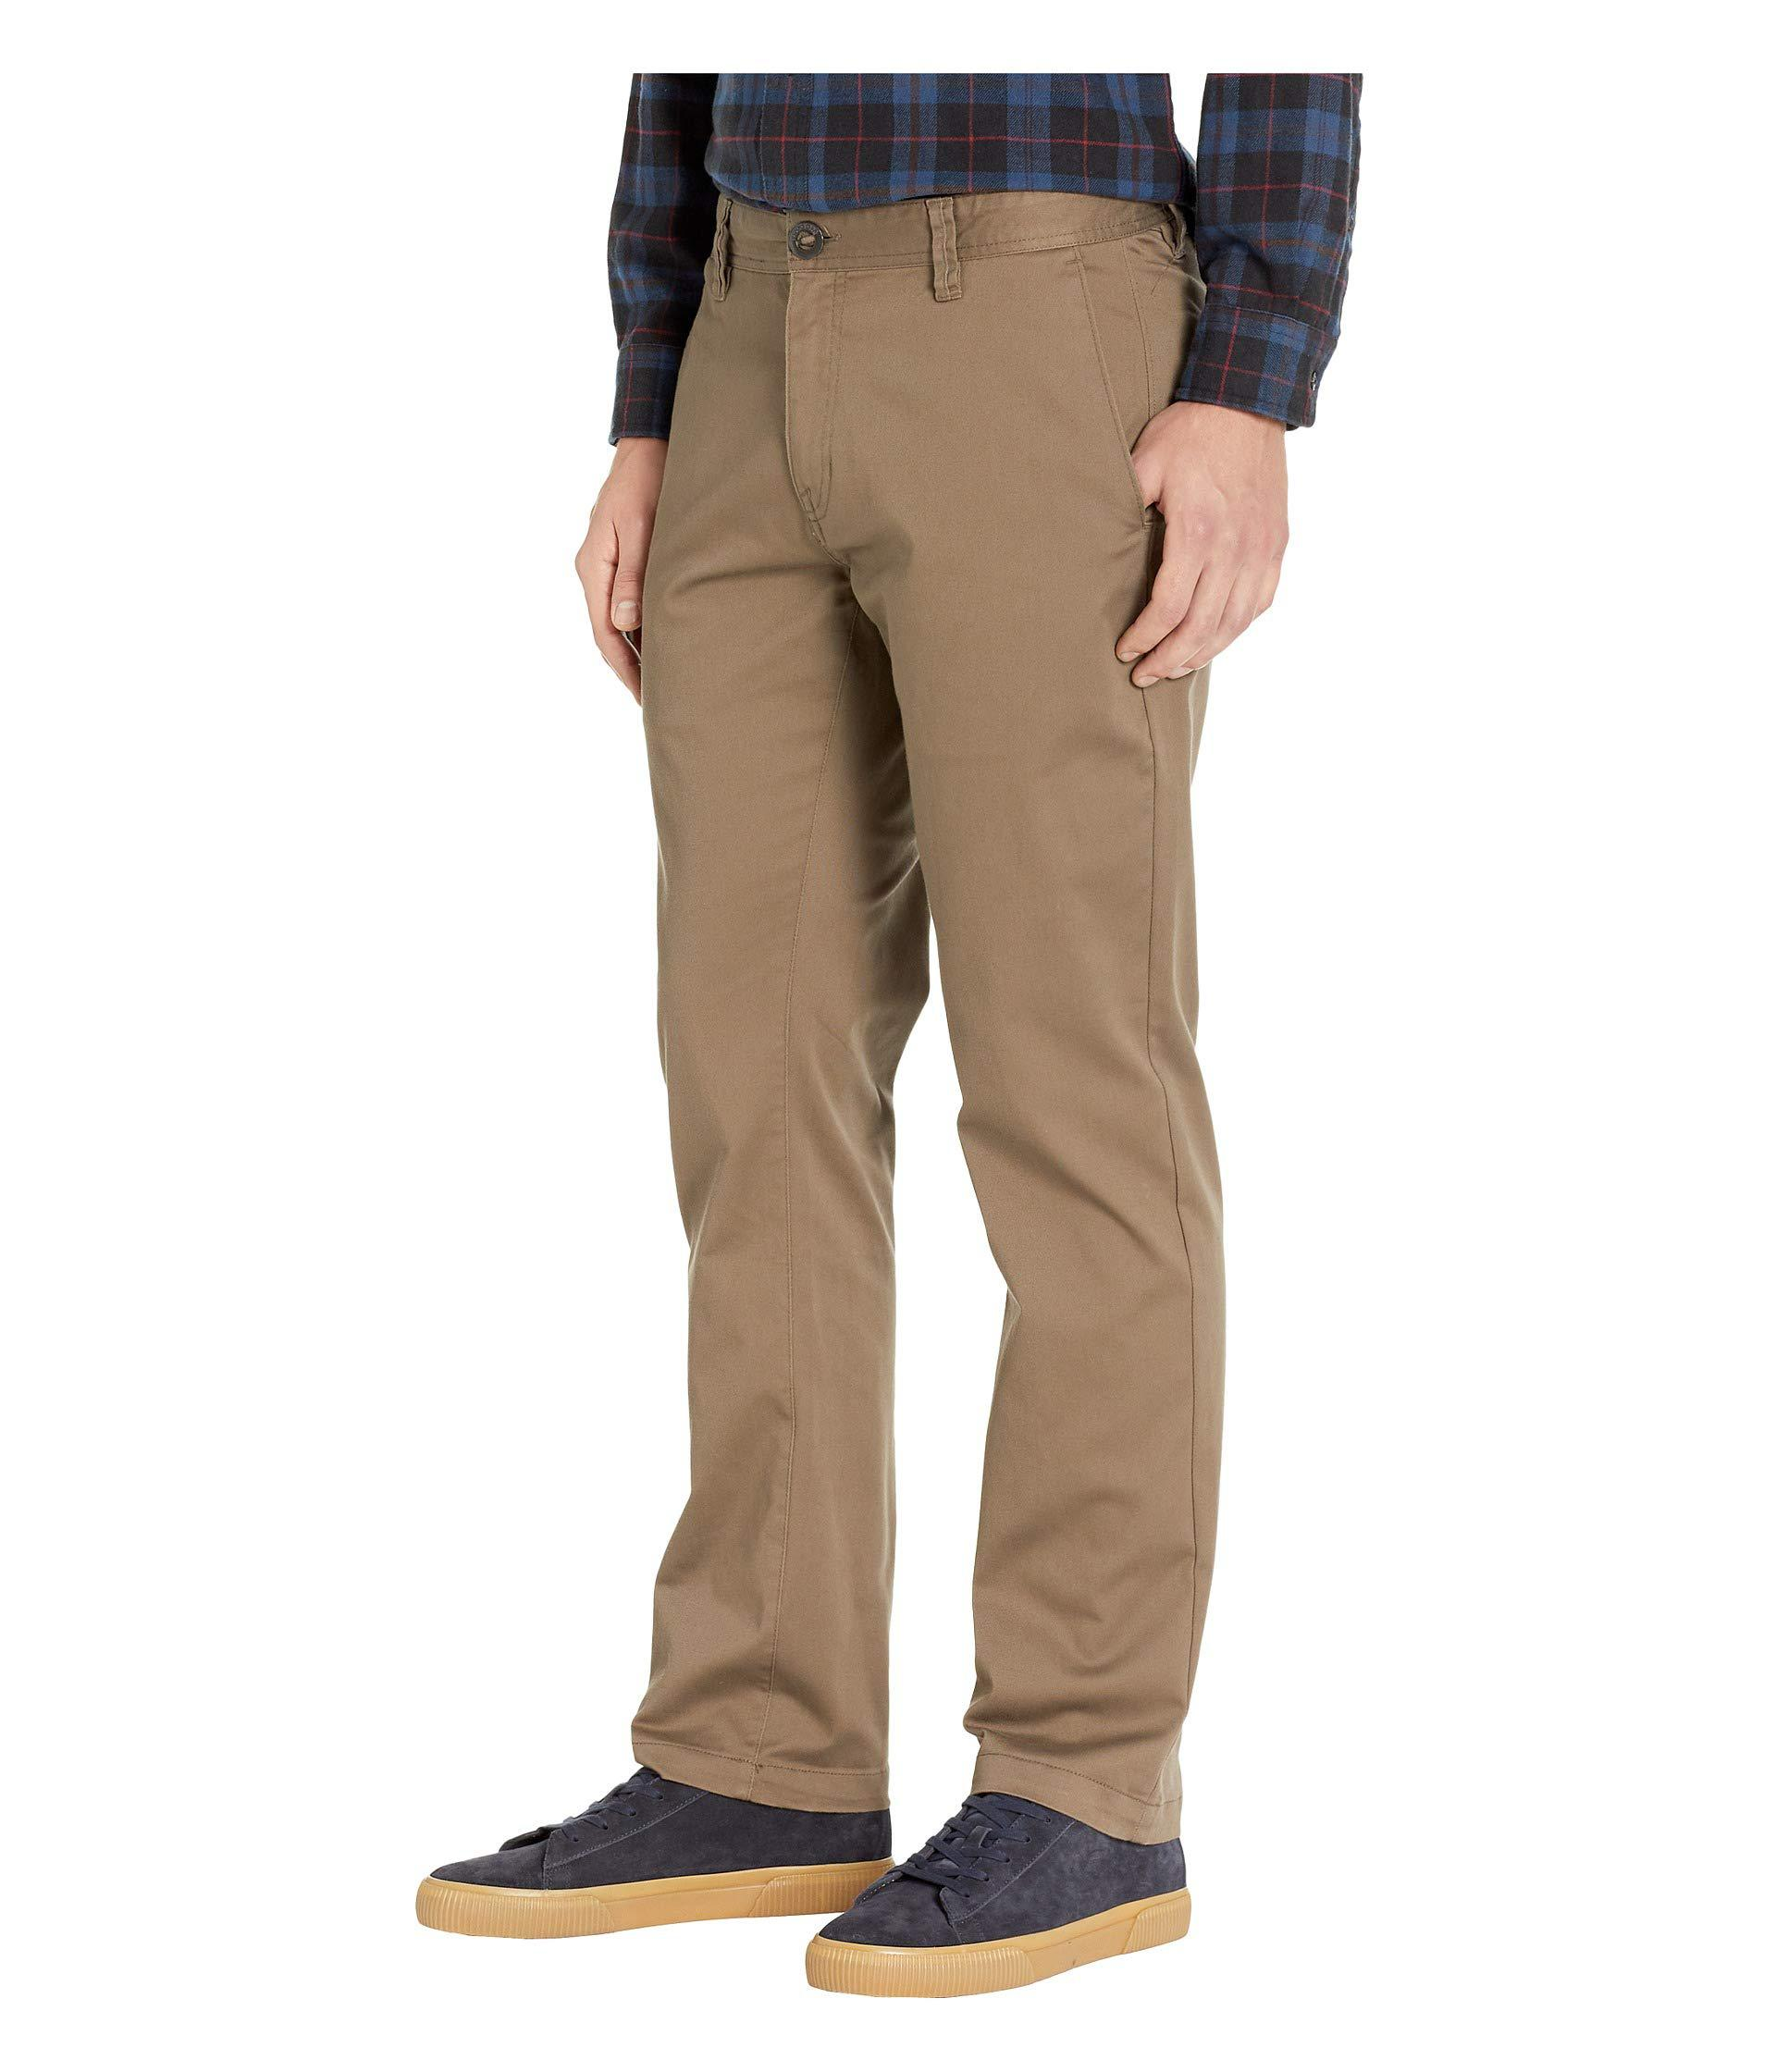 41898ce8 Lyst - Volcom Frickin Modern Stretch (mushroom) Men's Casual Pants in Brown  for Men